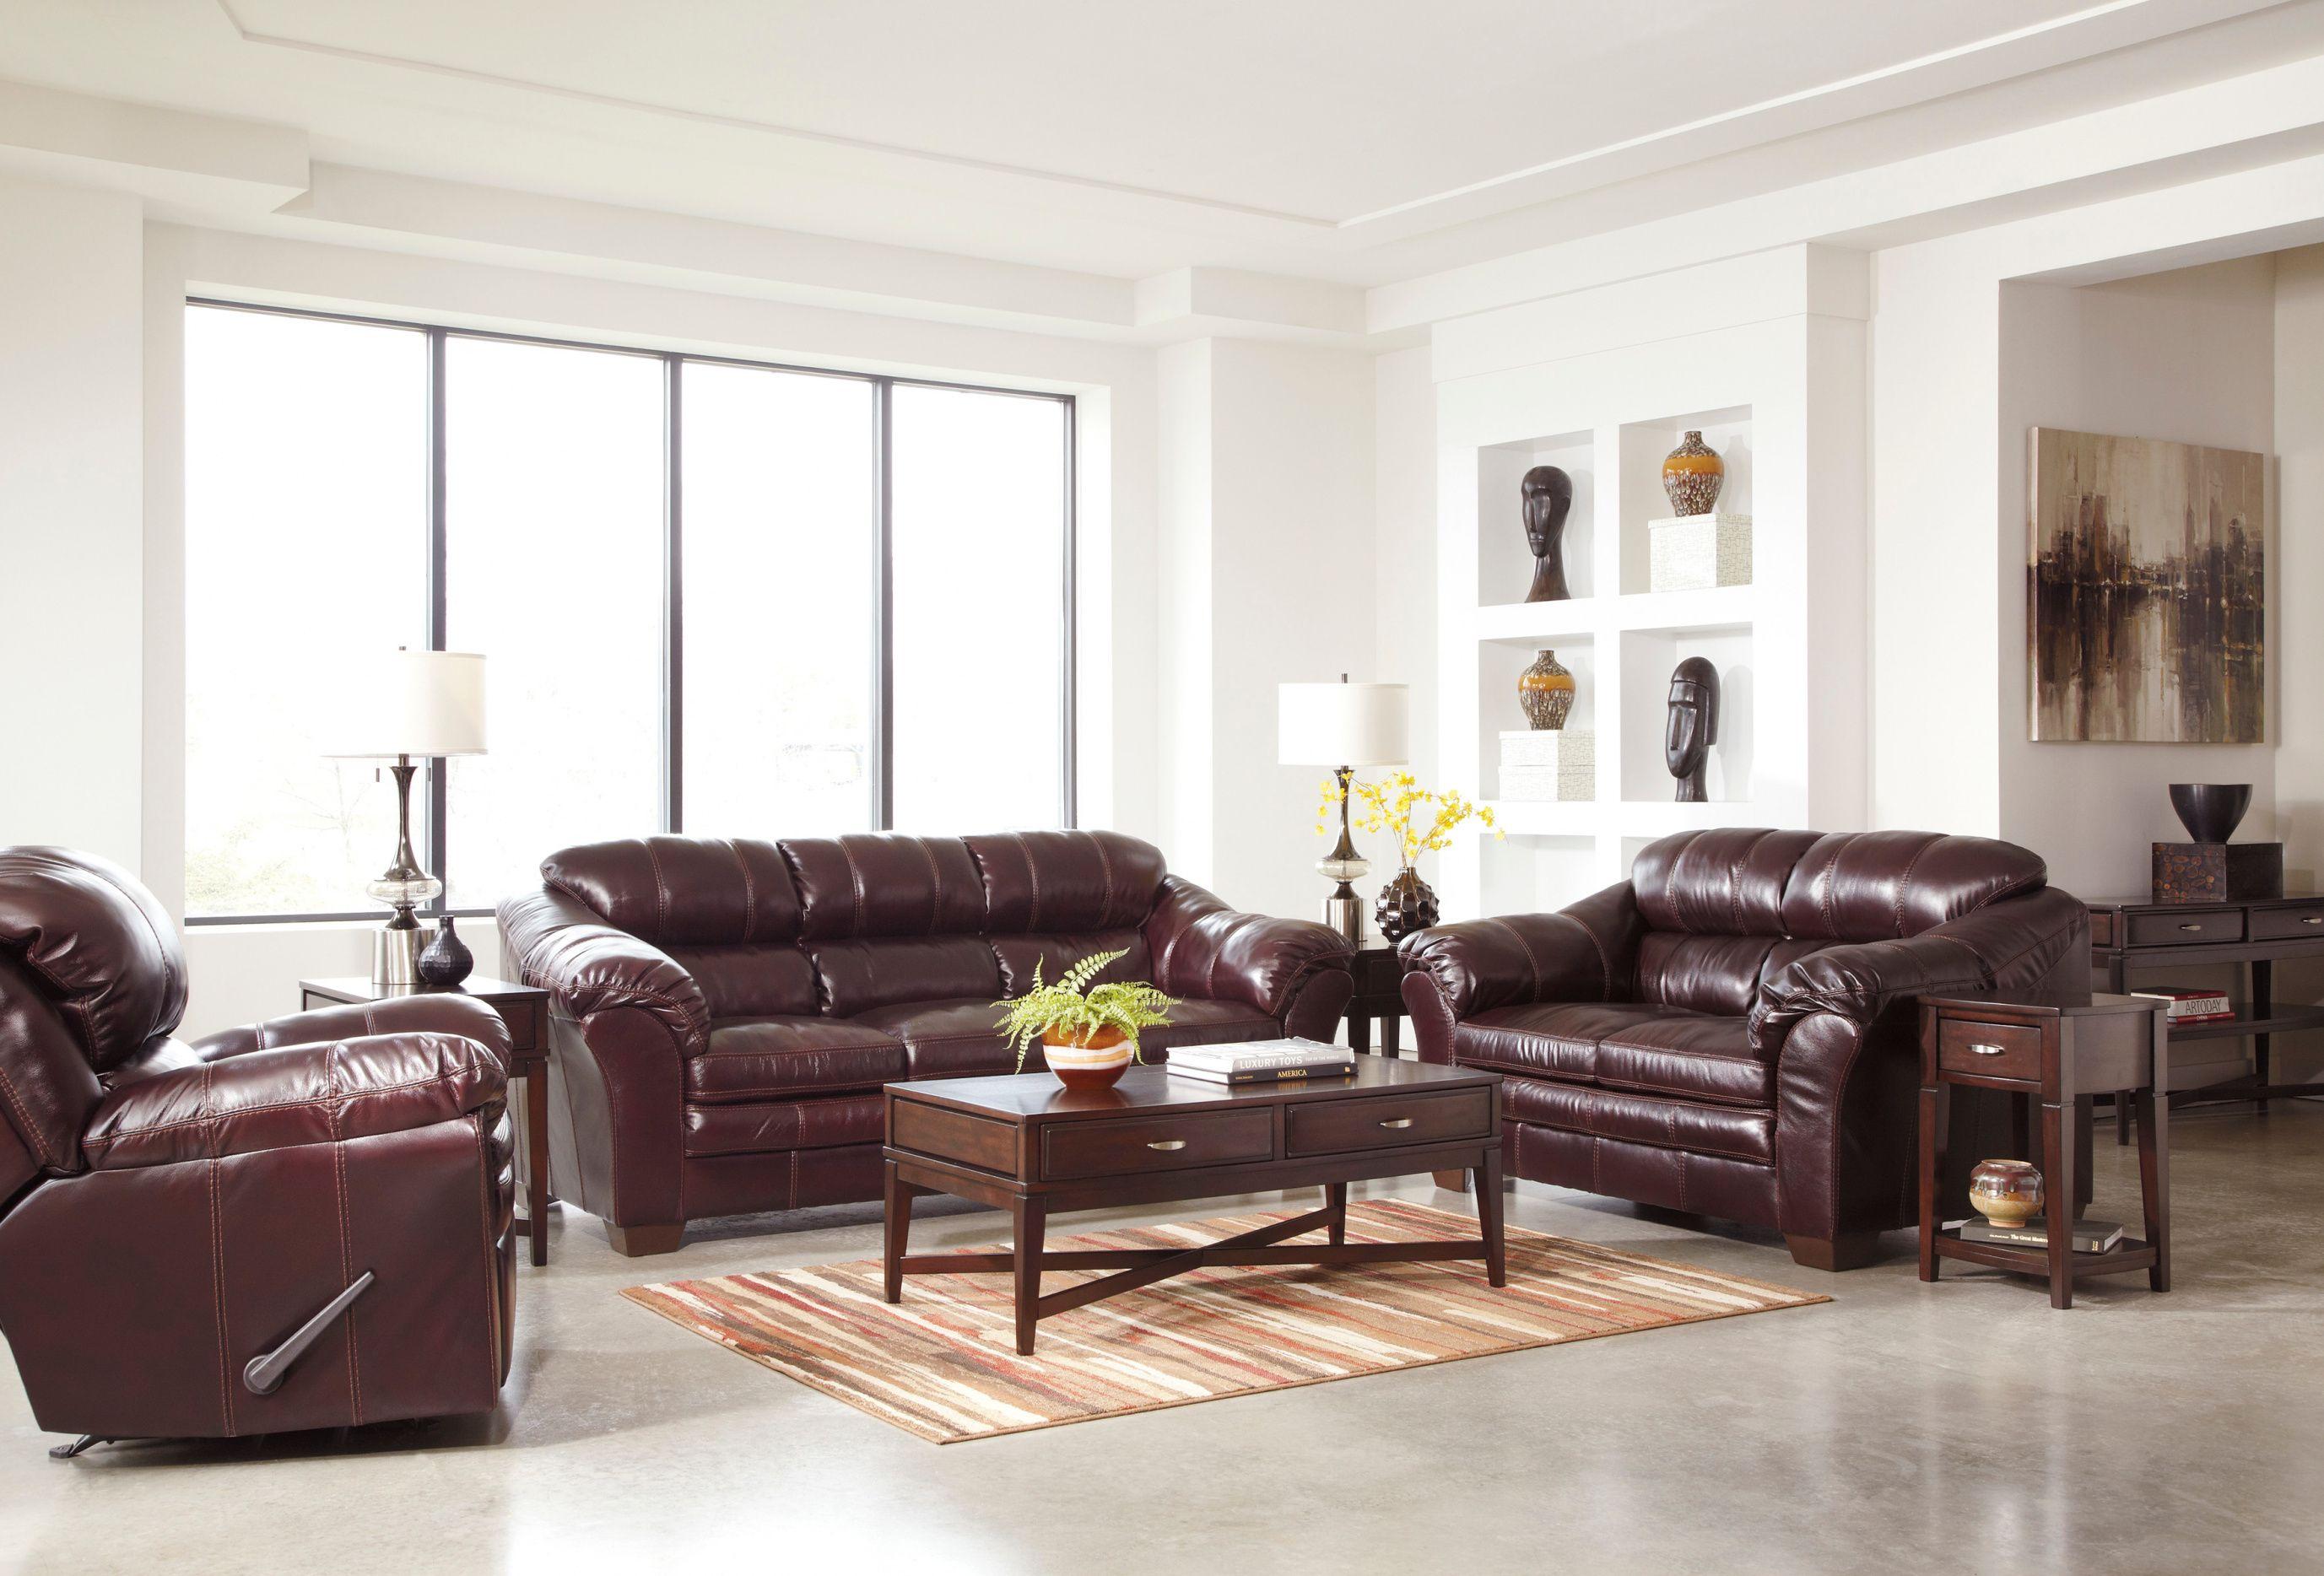 Ashley Home Furniture Customer Service - Best Master Furniture Check ...